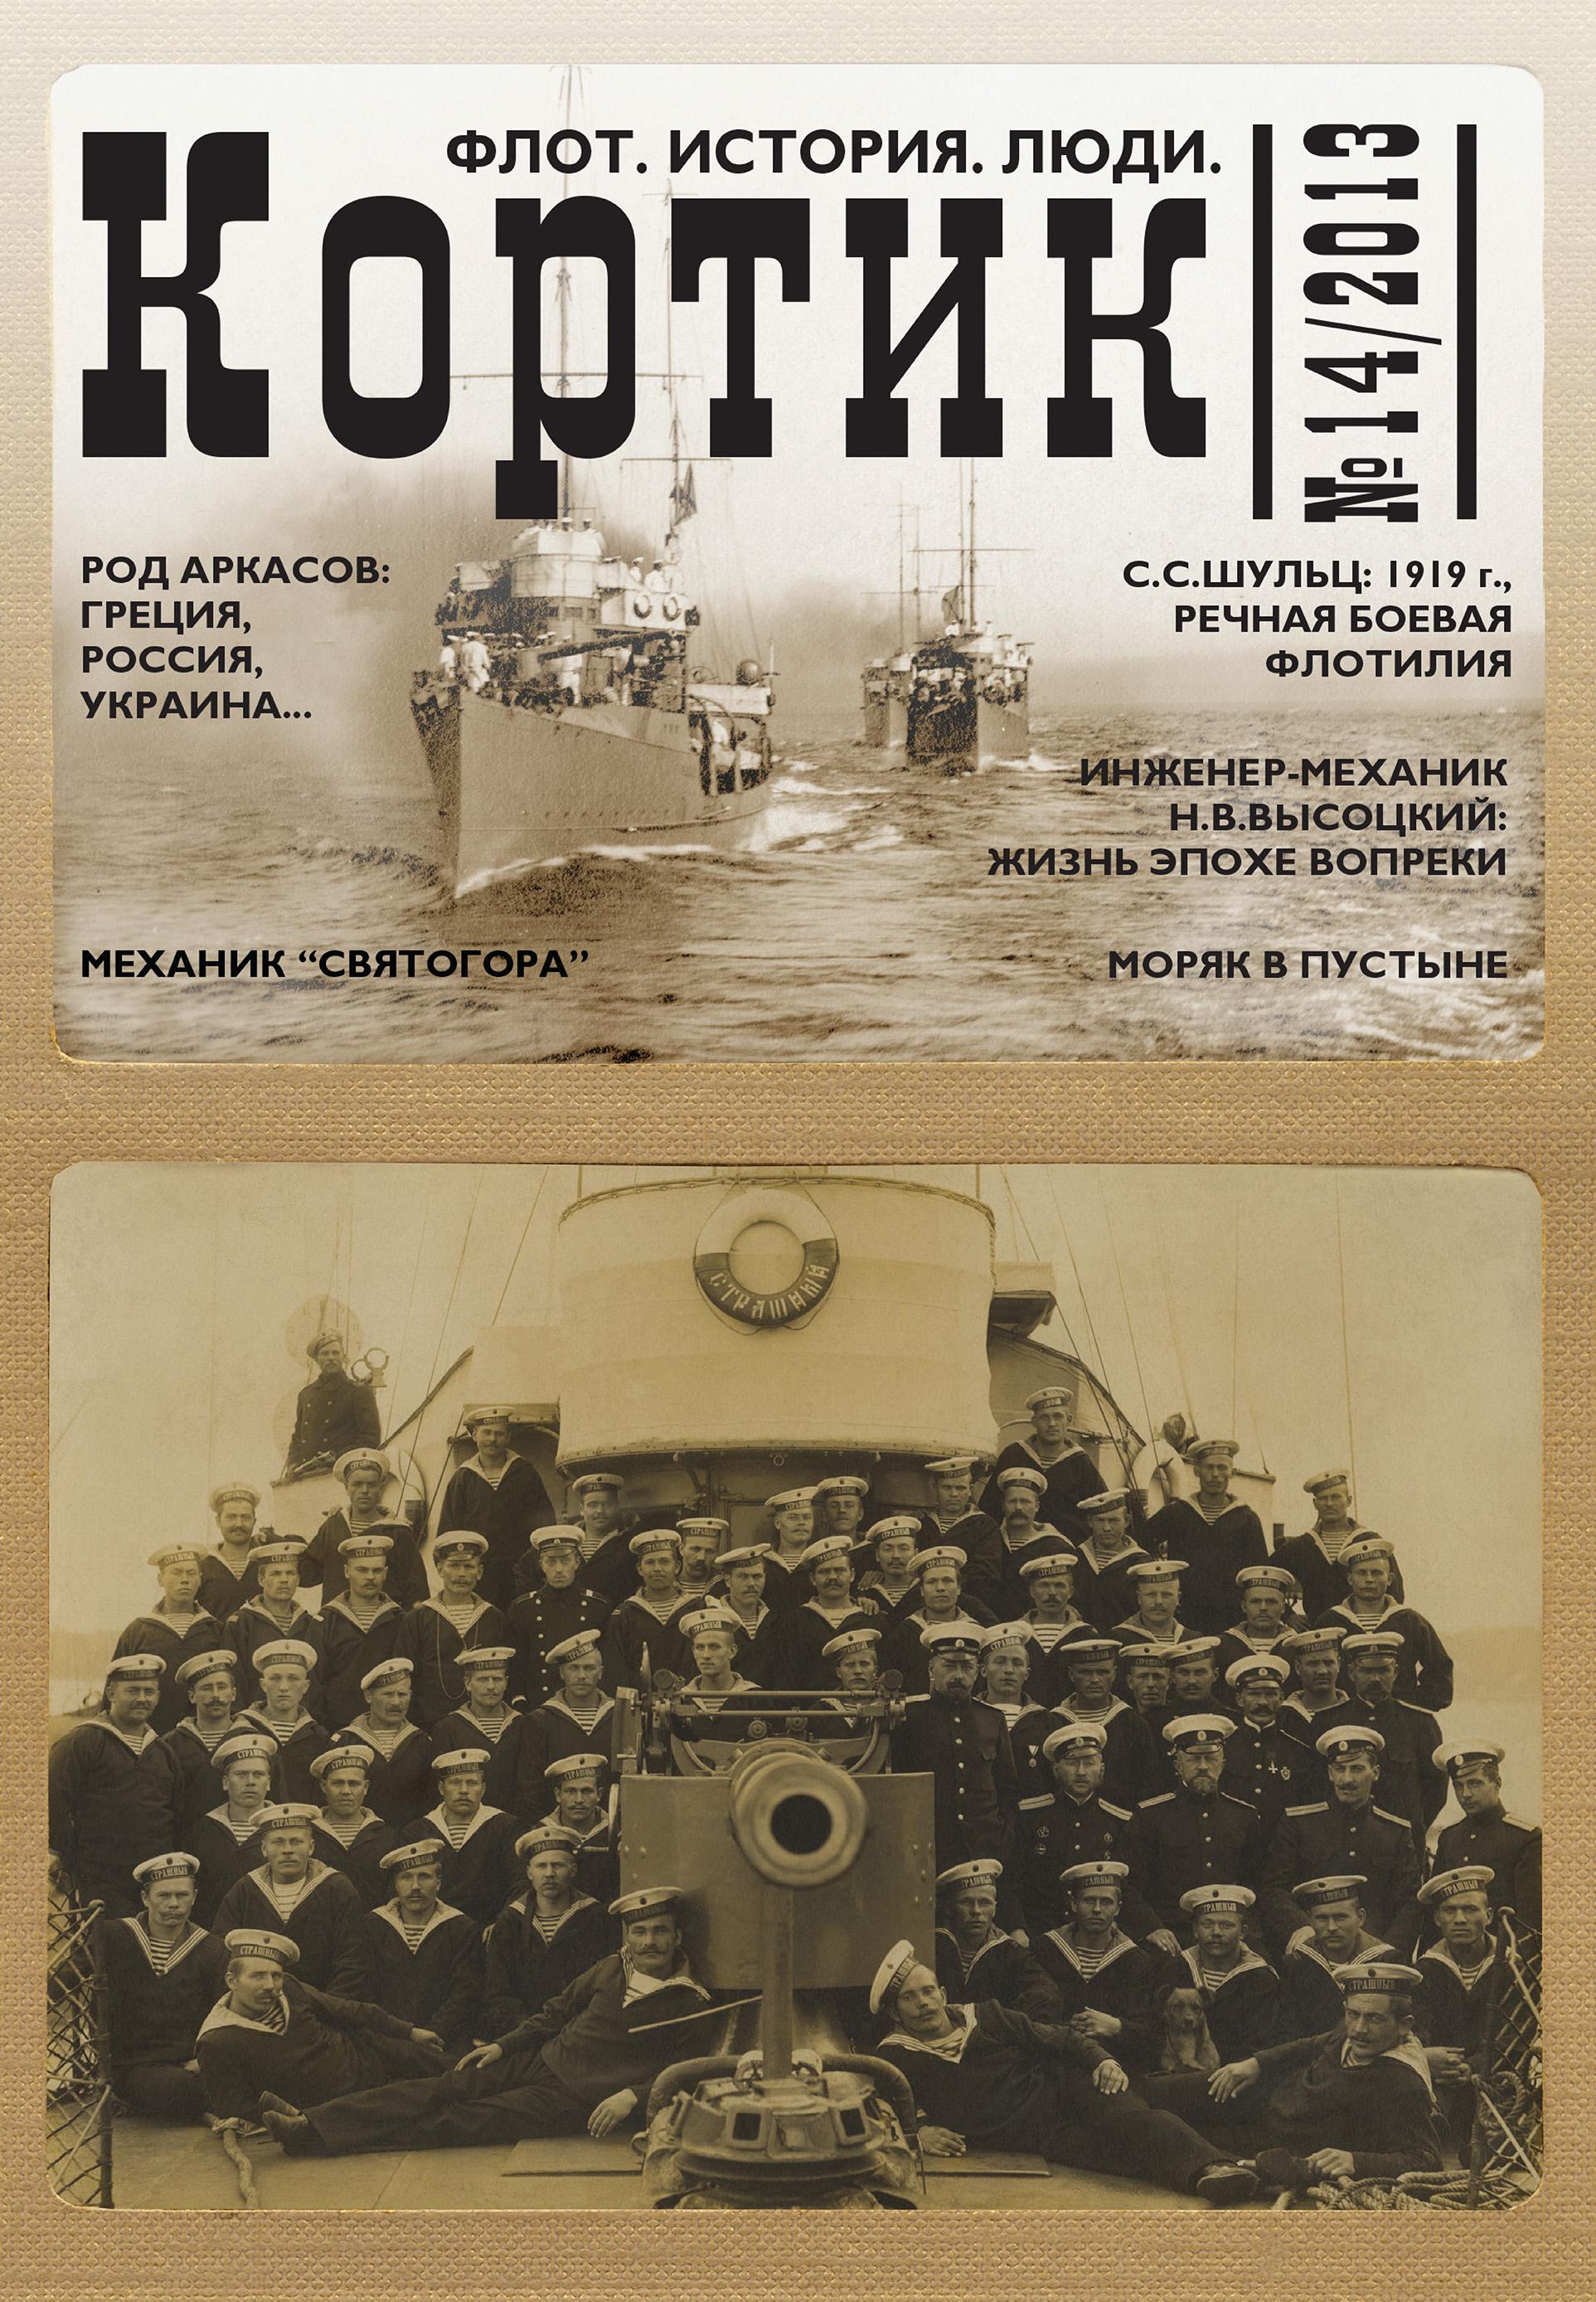 Кортик. Флот. История. Люди. № 14 / 2013